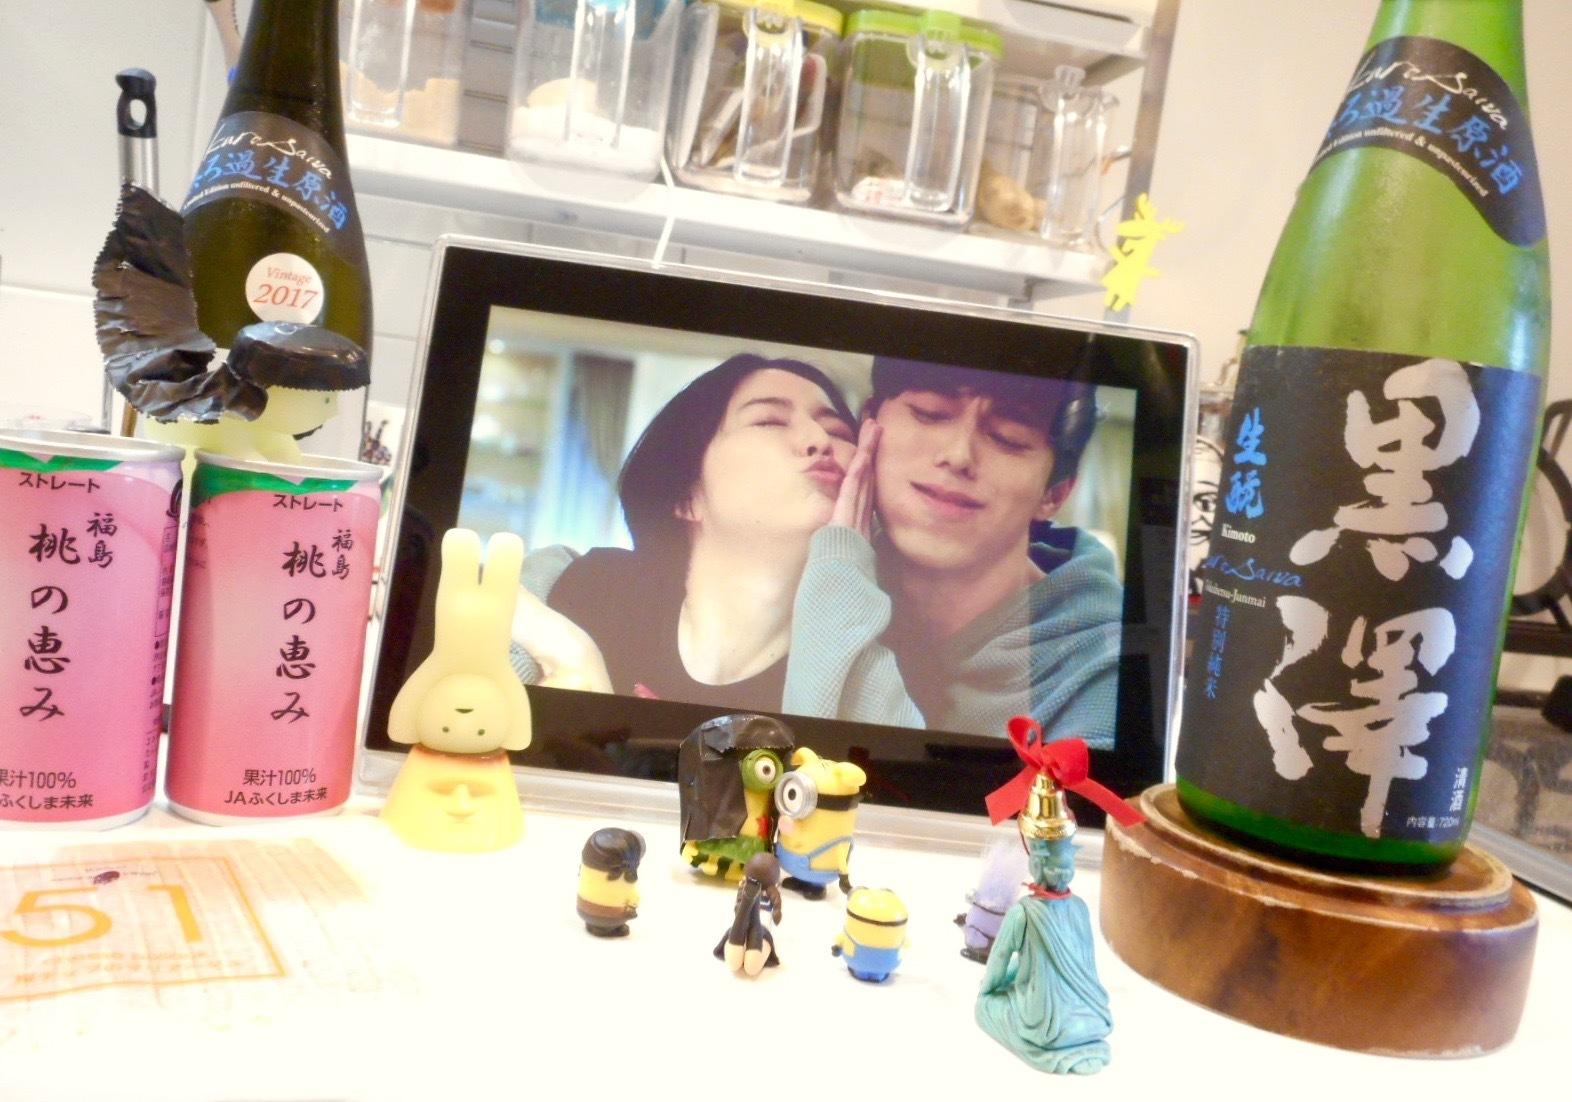 kurosawa_tokujun29by1.jpg